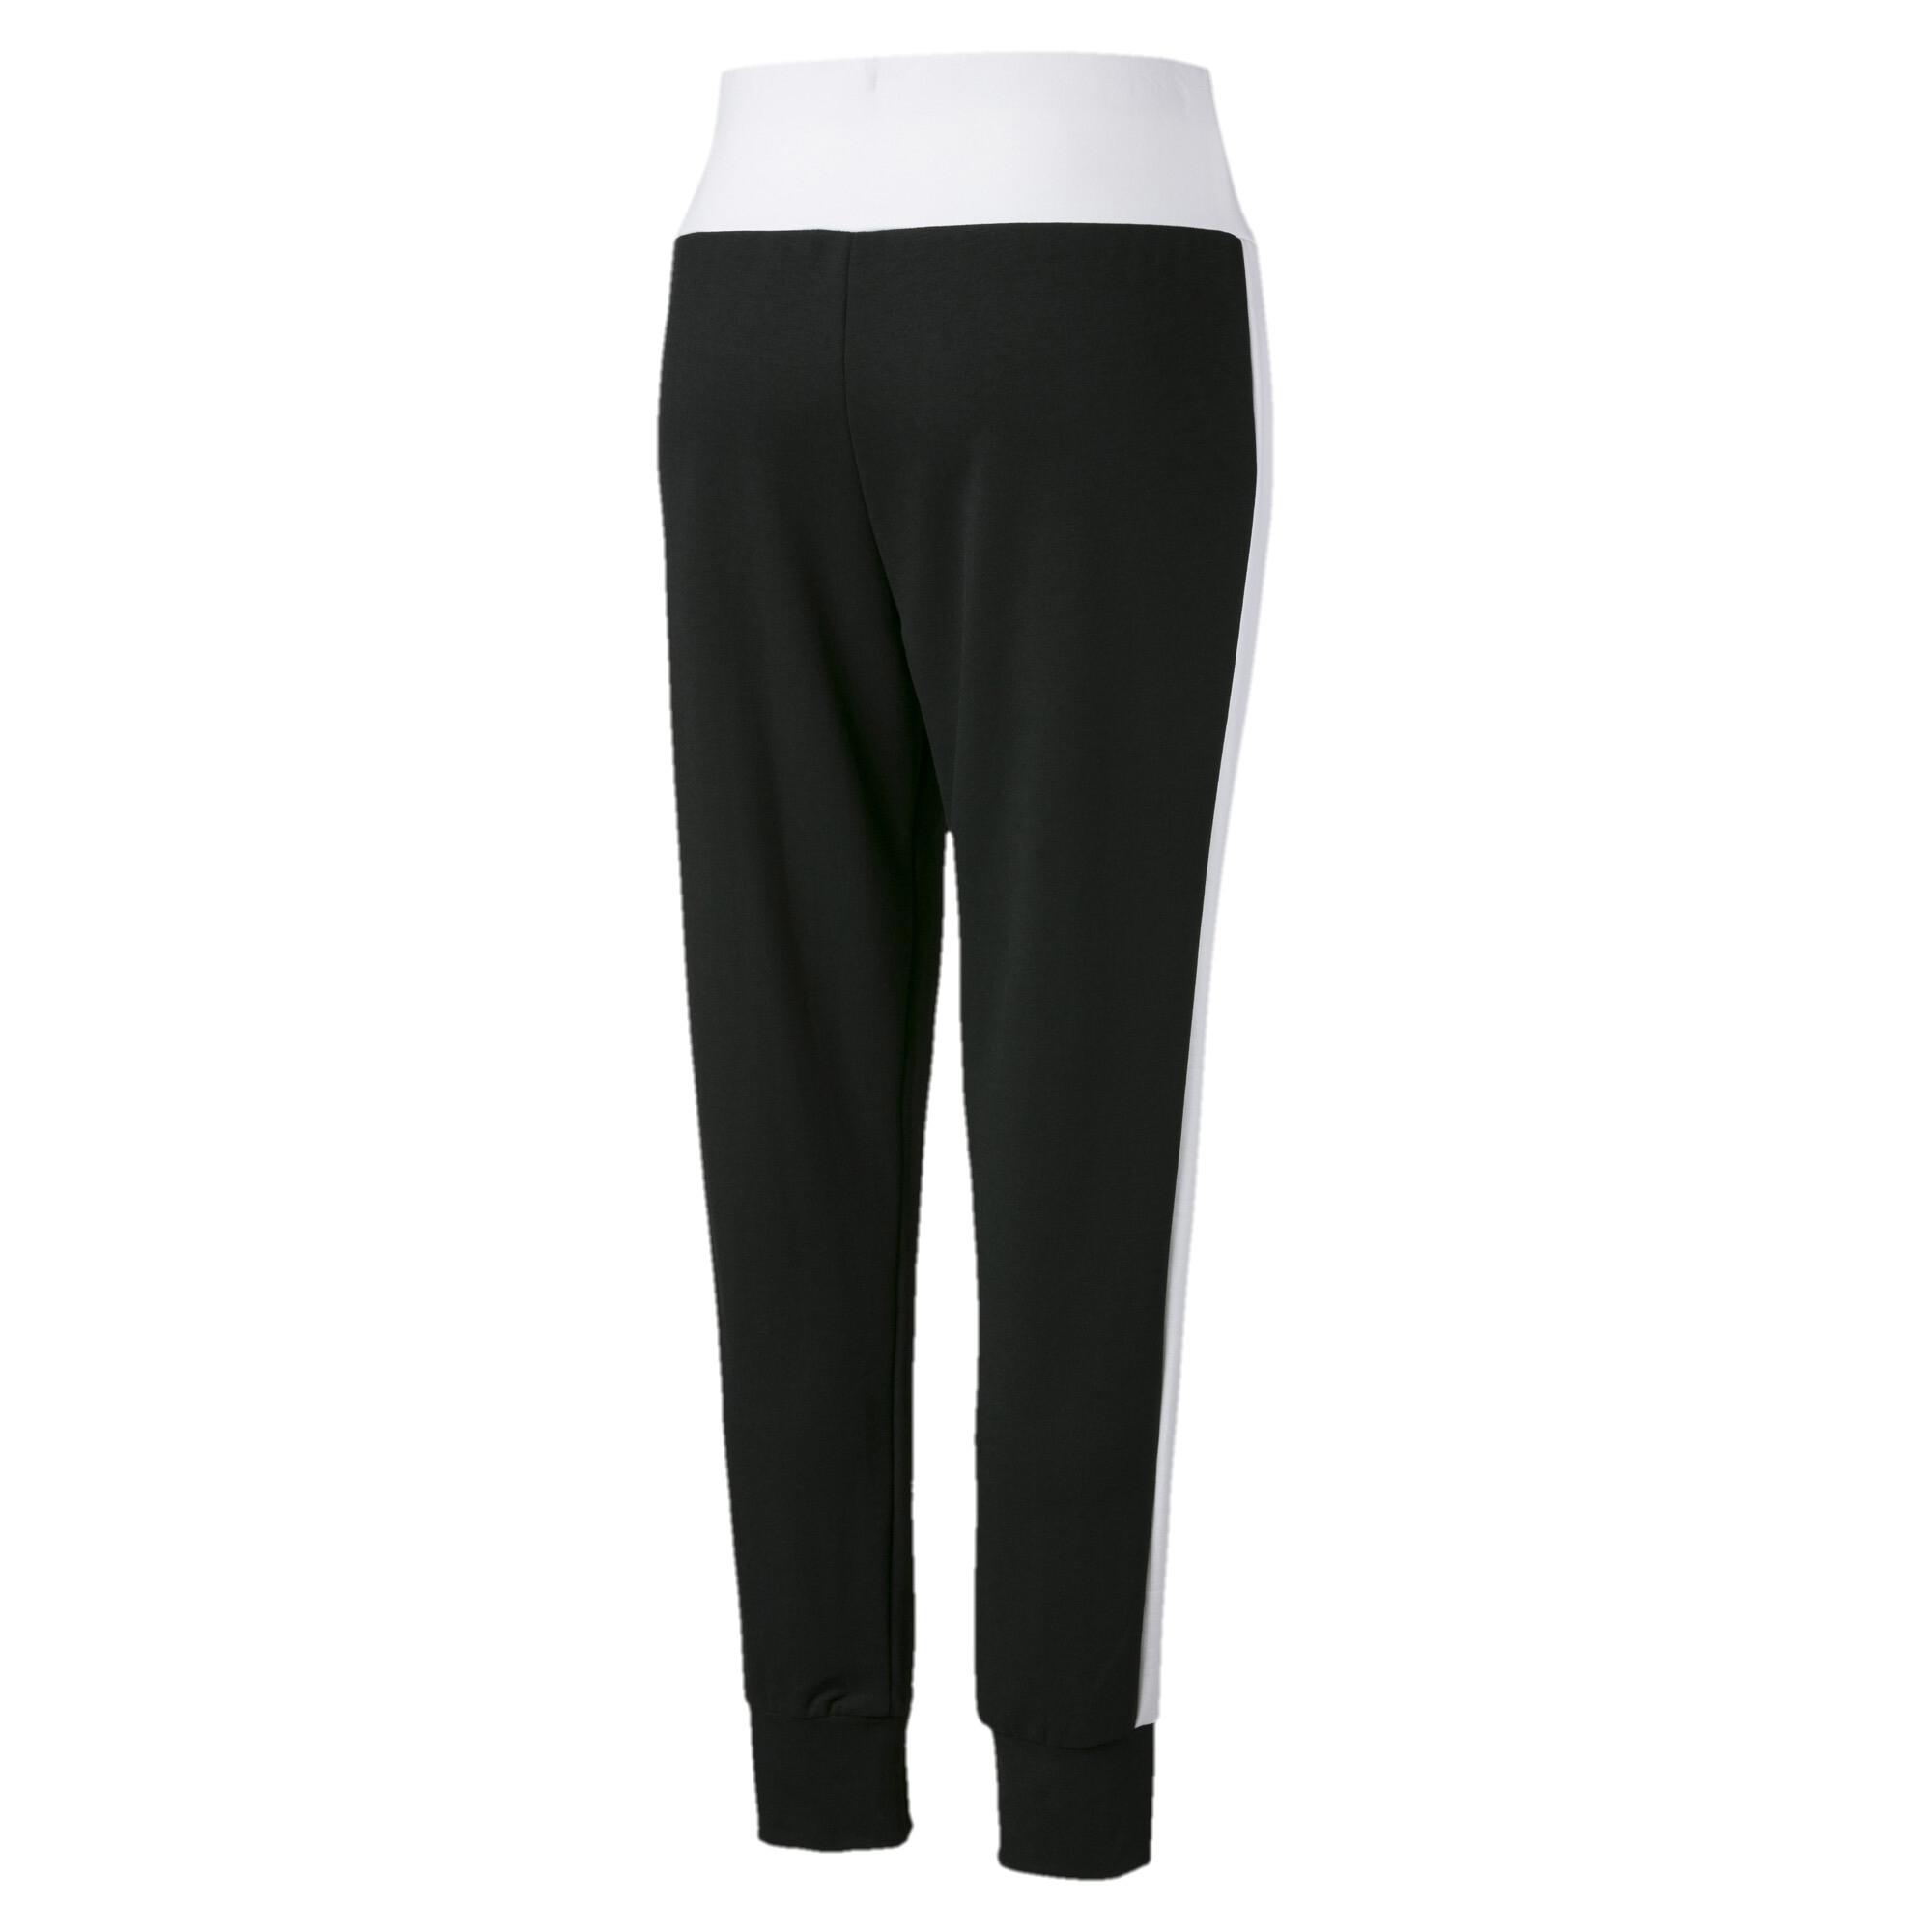 PUMA-Modern-Sports-Women-039-s-Track-Pants-Women-Knitted-Pants-Basics thumbnail 13